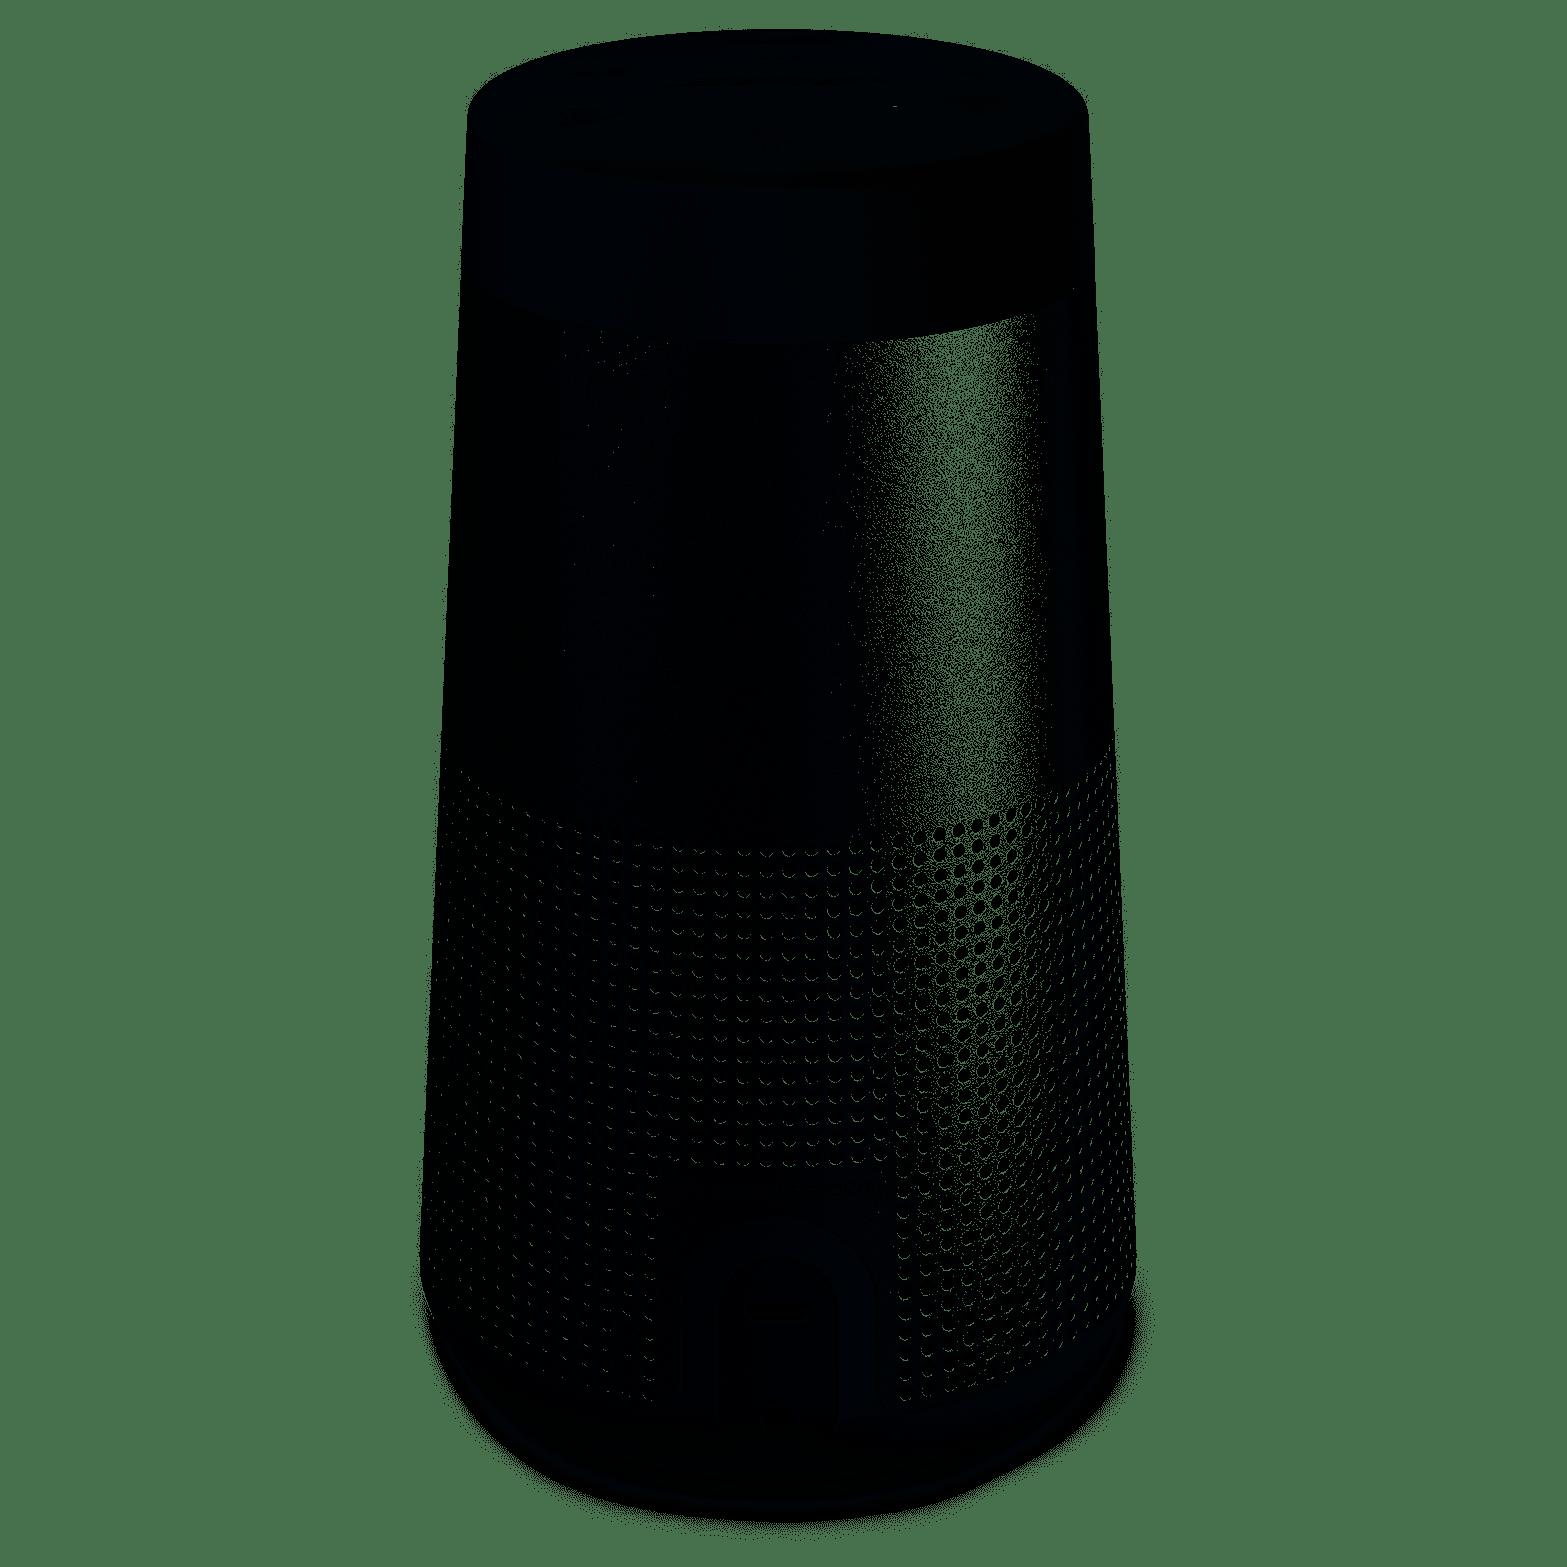 Bose-revolve-1.png